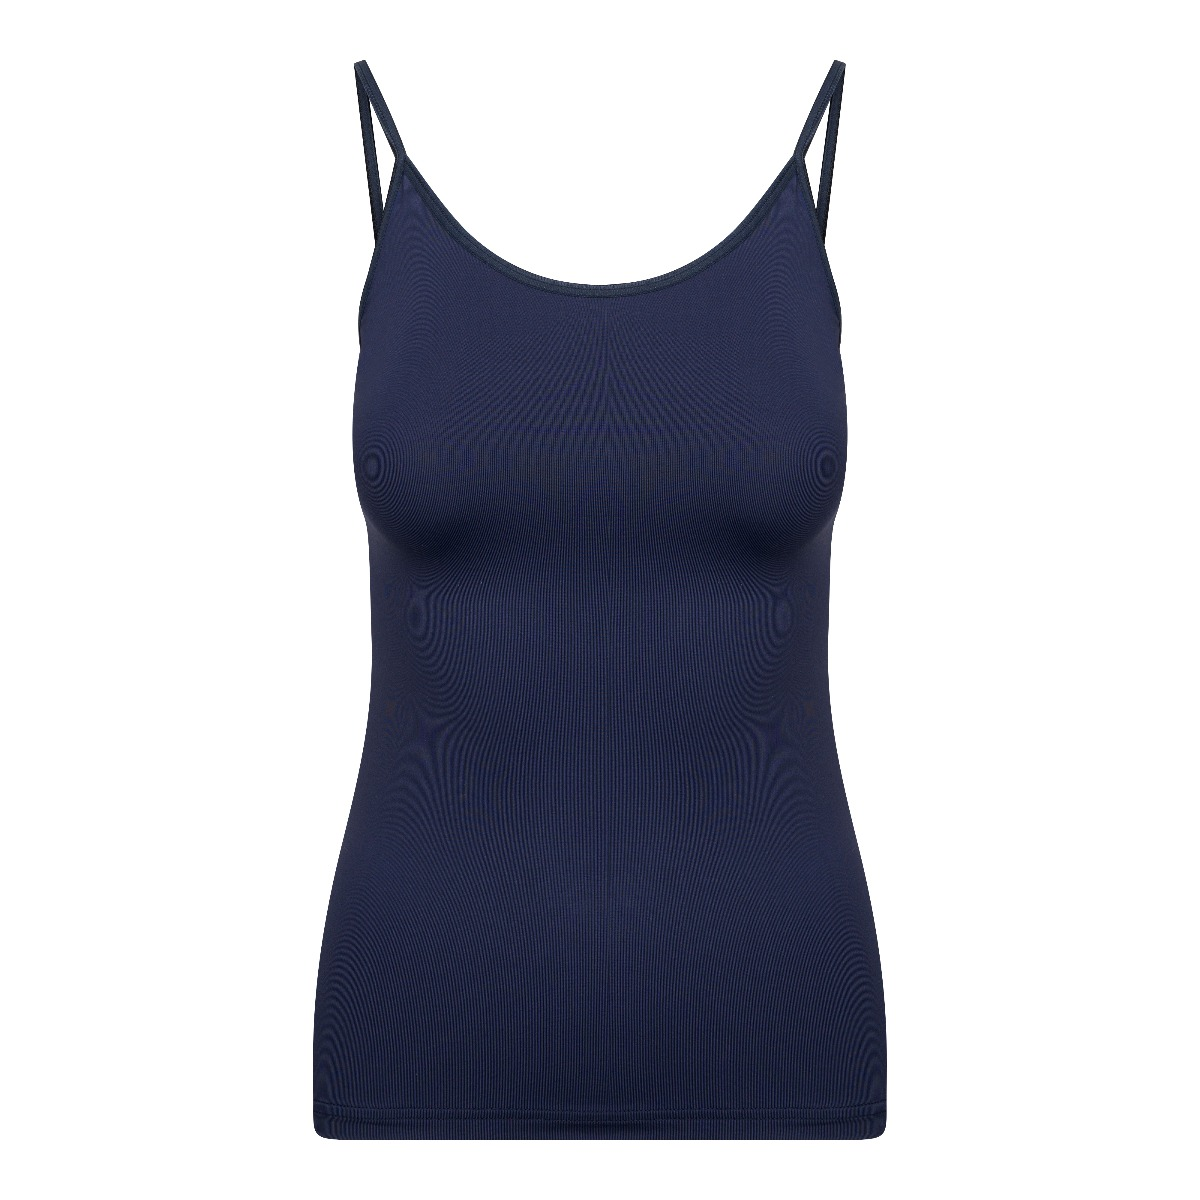 RJ Pure Color Dames Spaghetti Top Donkerblauw XL